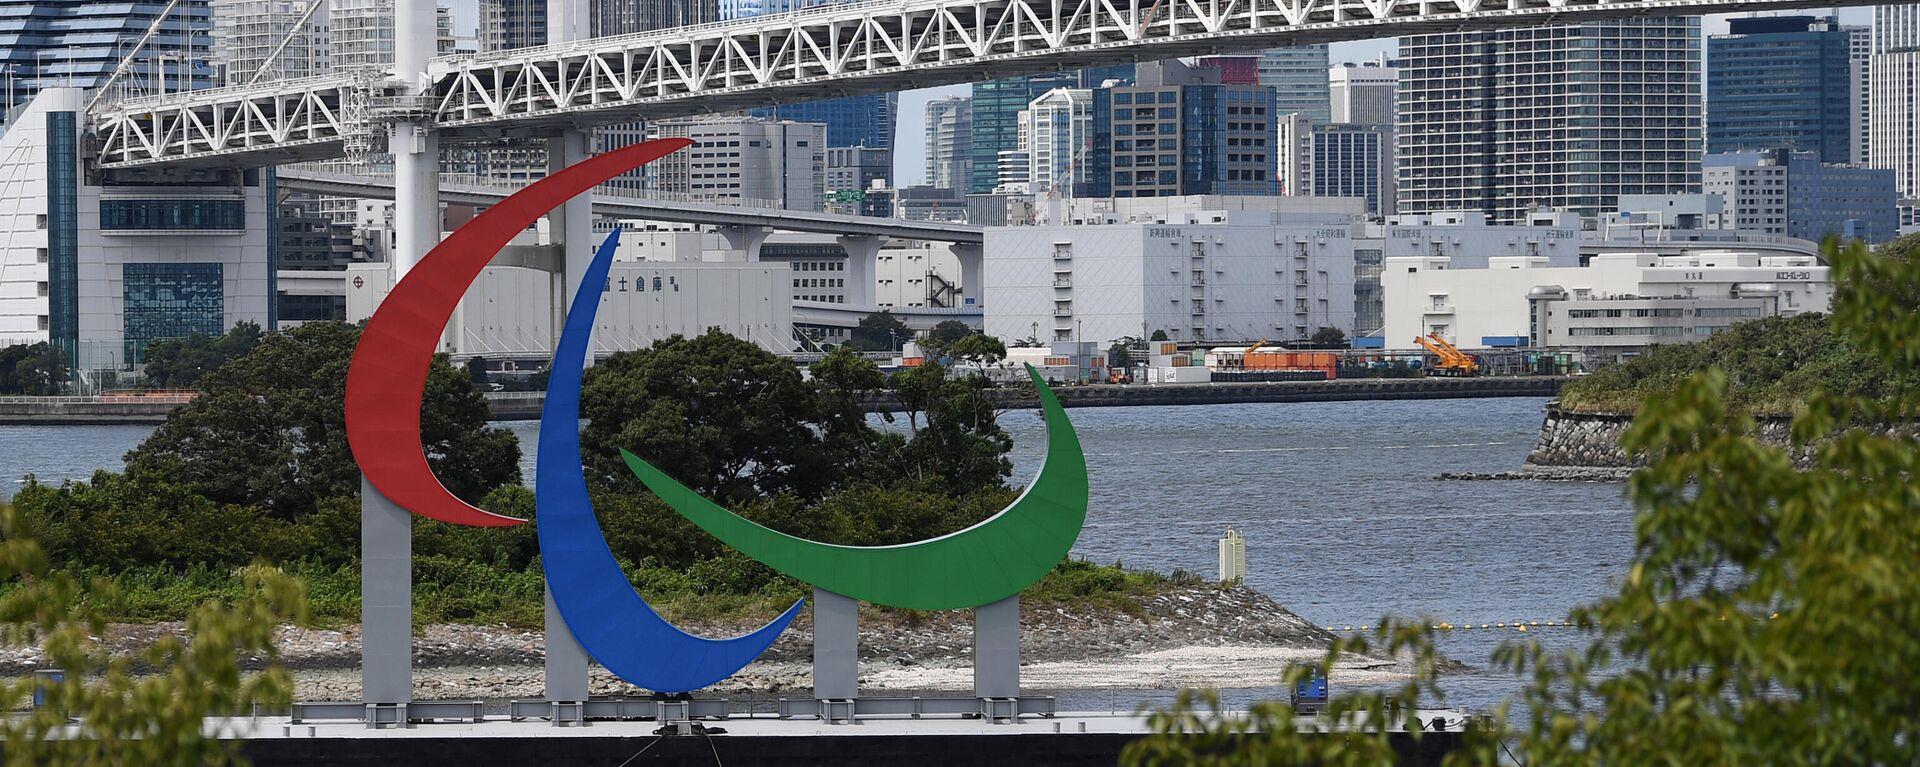 Sommer-Paralympics in Tokio - SNA, 1920, 23.08.2021